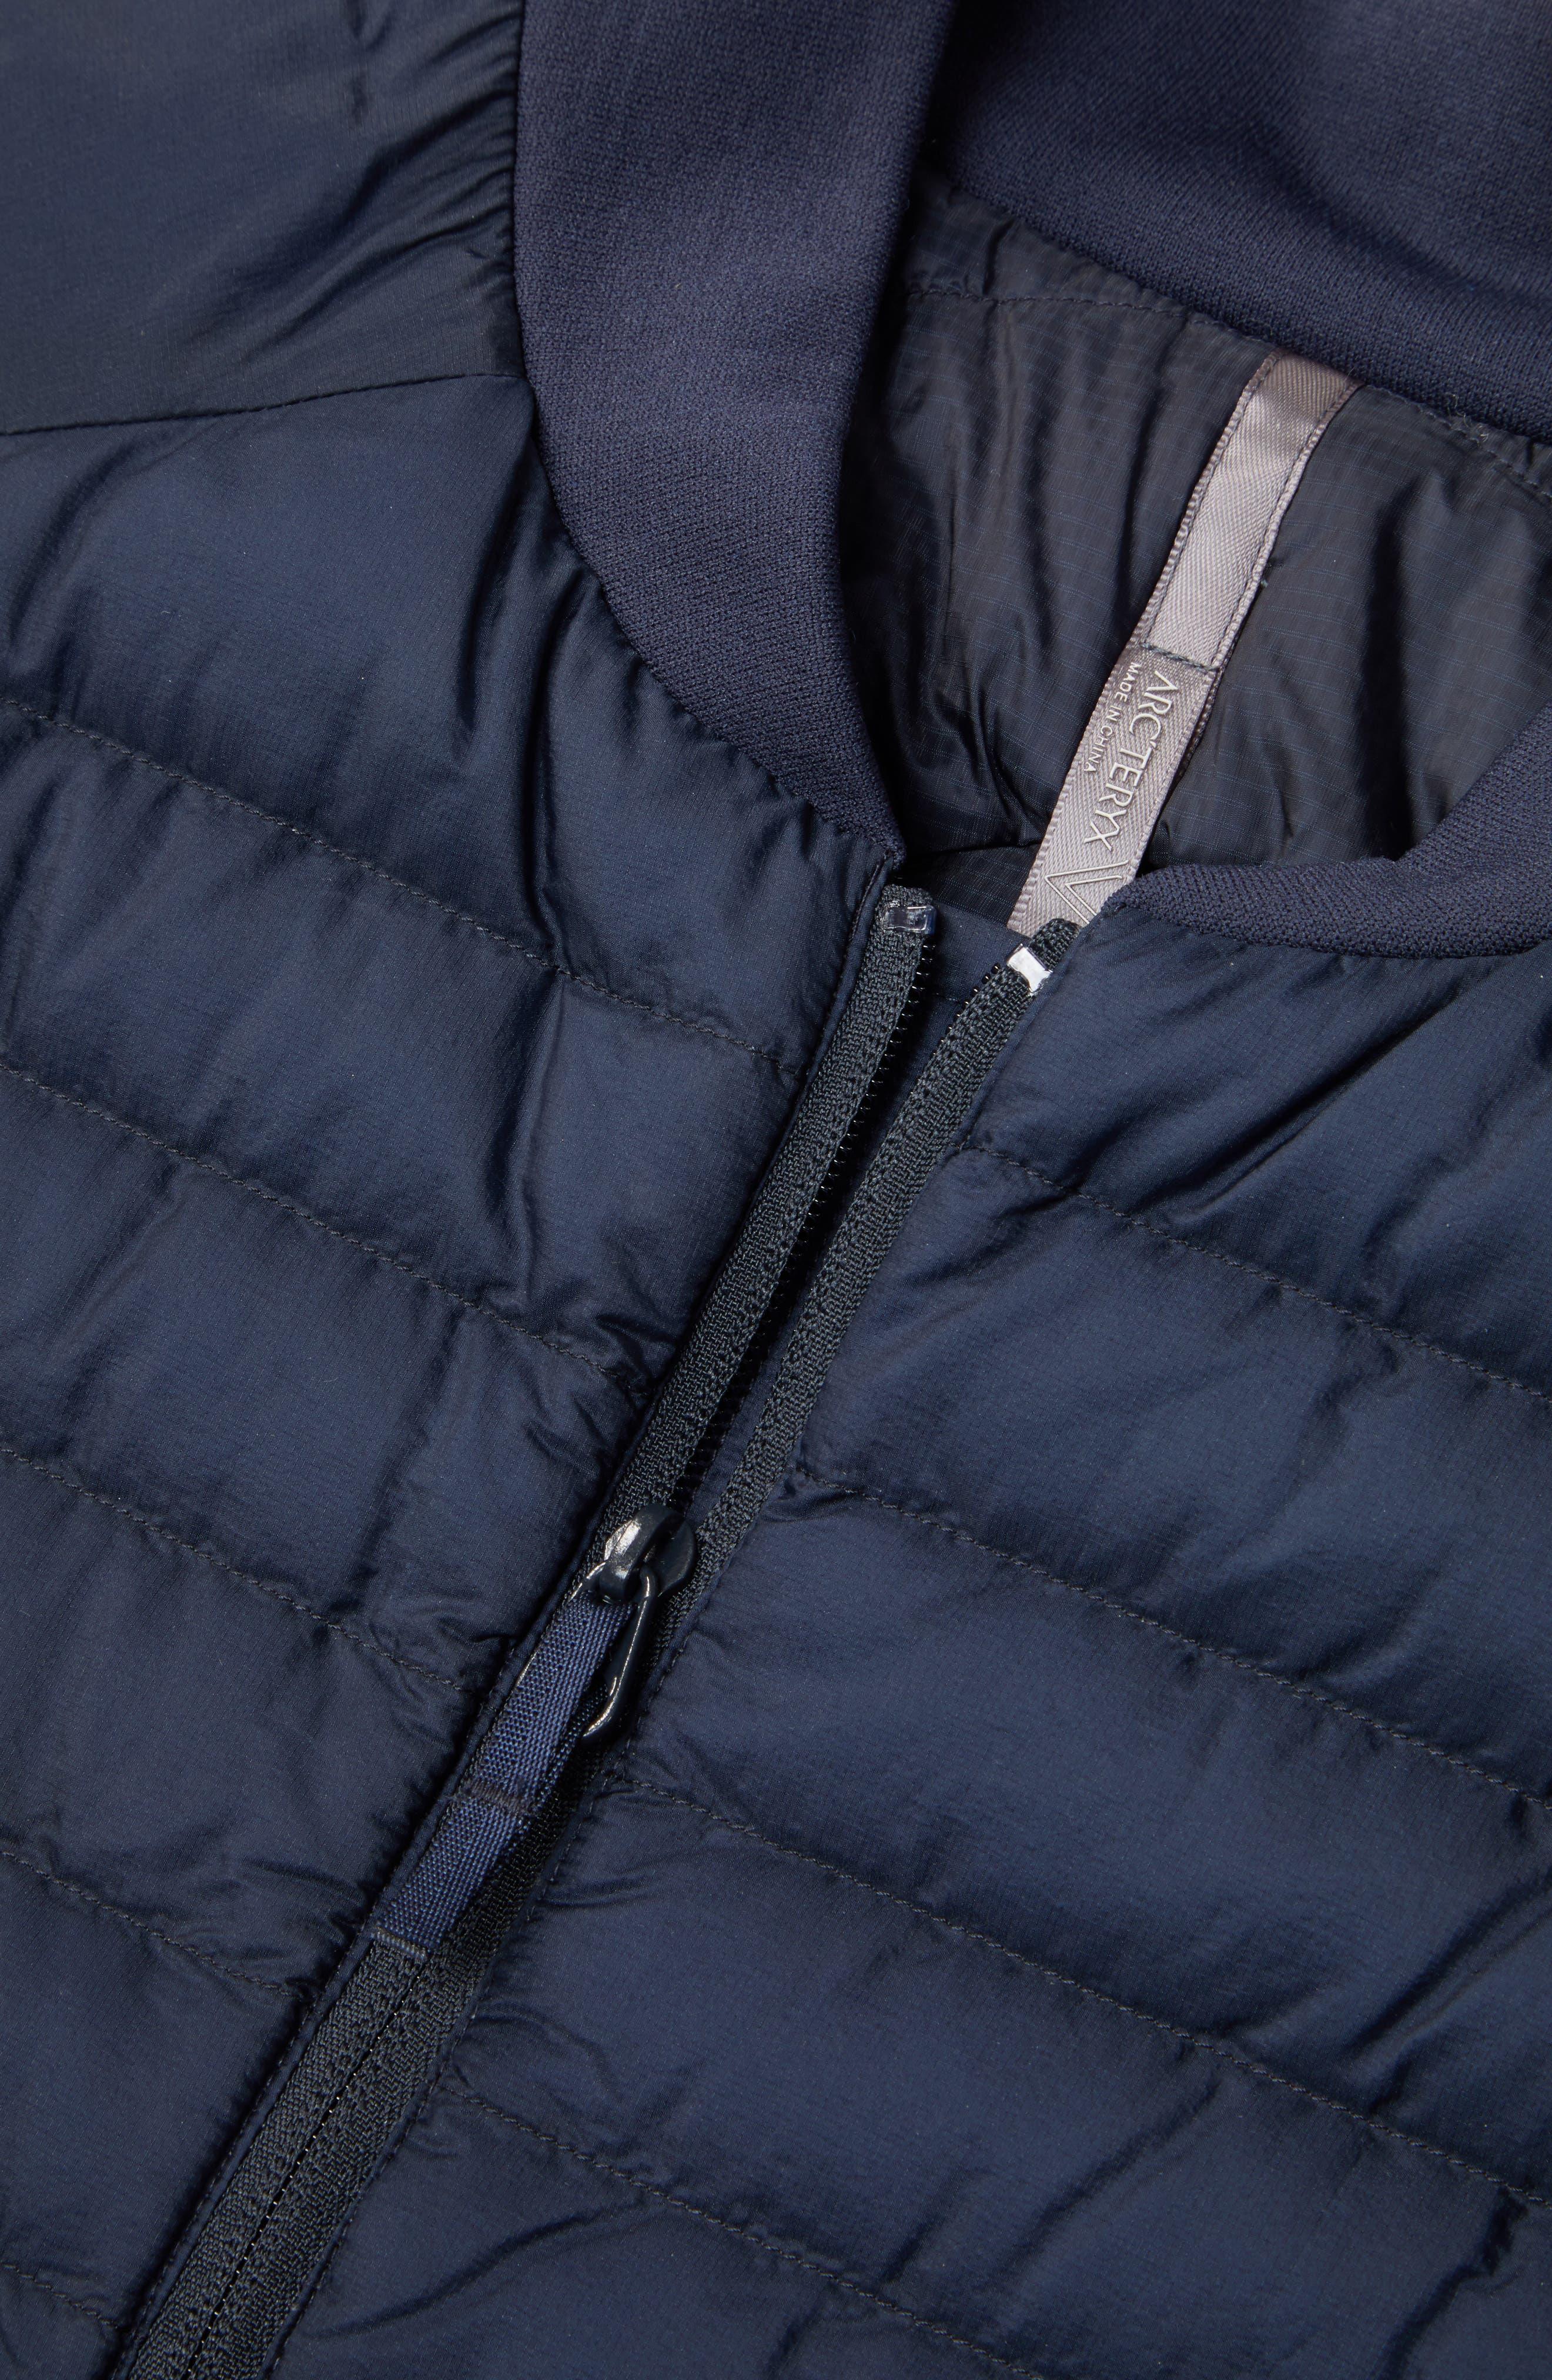 Conduit Lightweight Down Vest,                             Alternate thumbnail 6, color,                             DARK NAVY